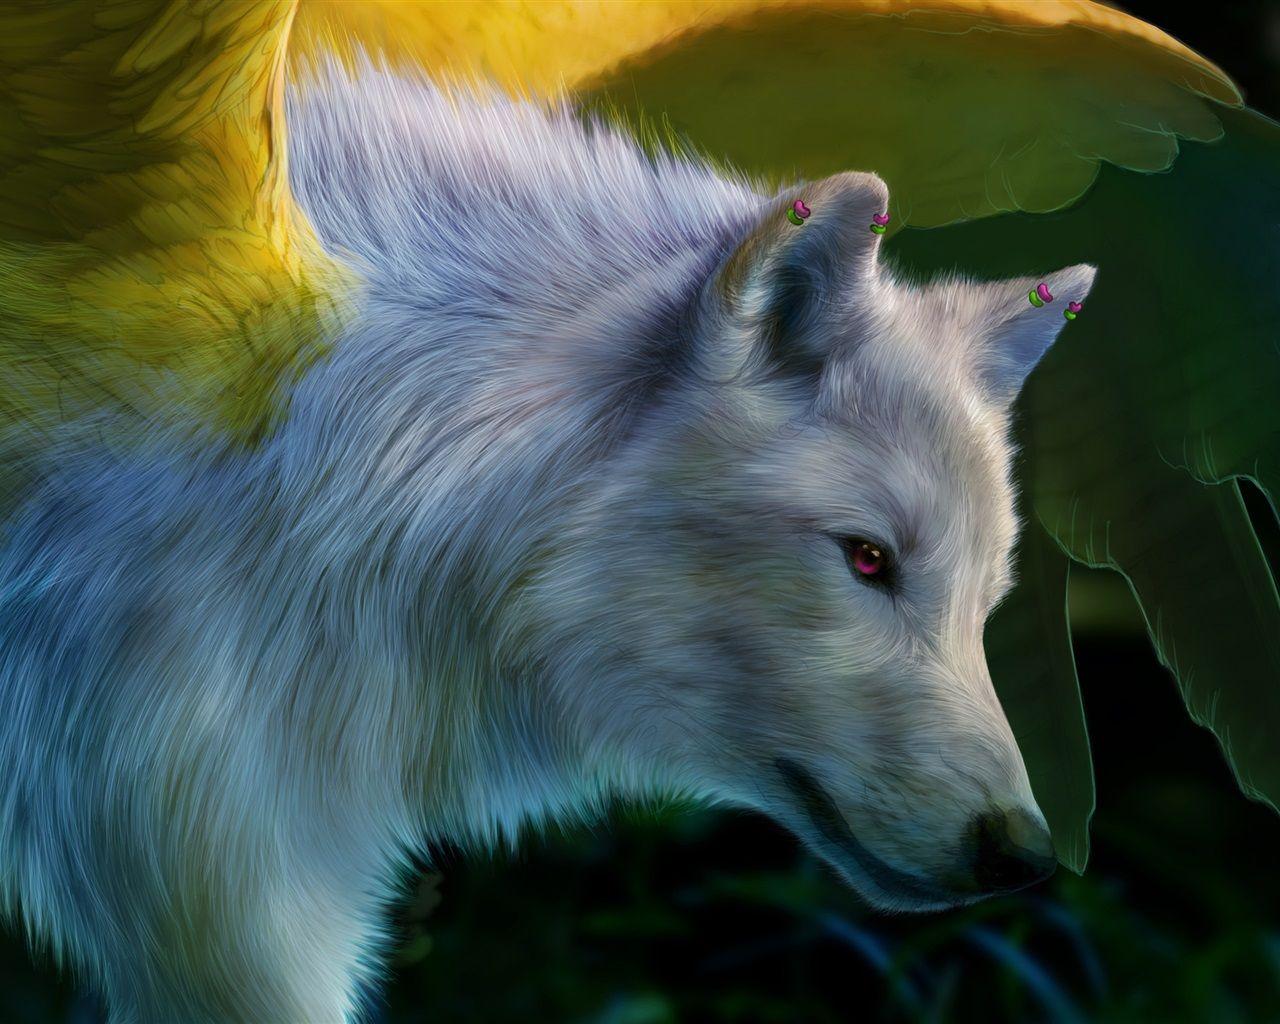 Peinture D Art Loup Blanc Ailes Fonds D Ecran Animales Art De La Peinture Loup Blanc